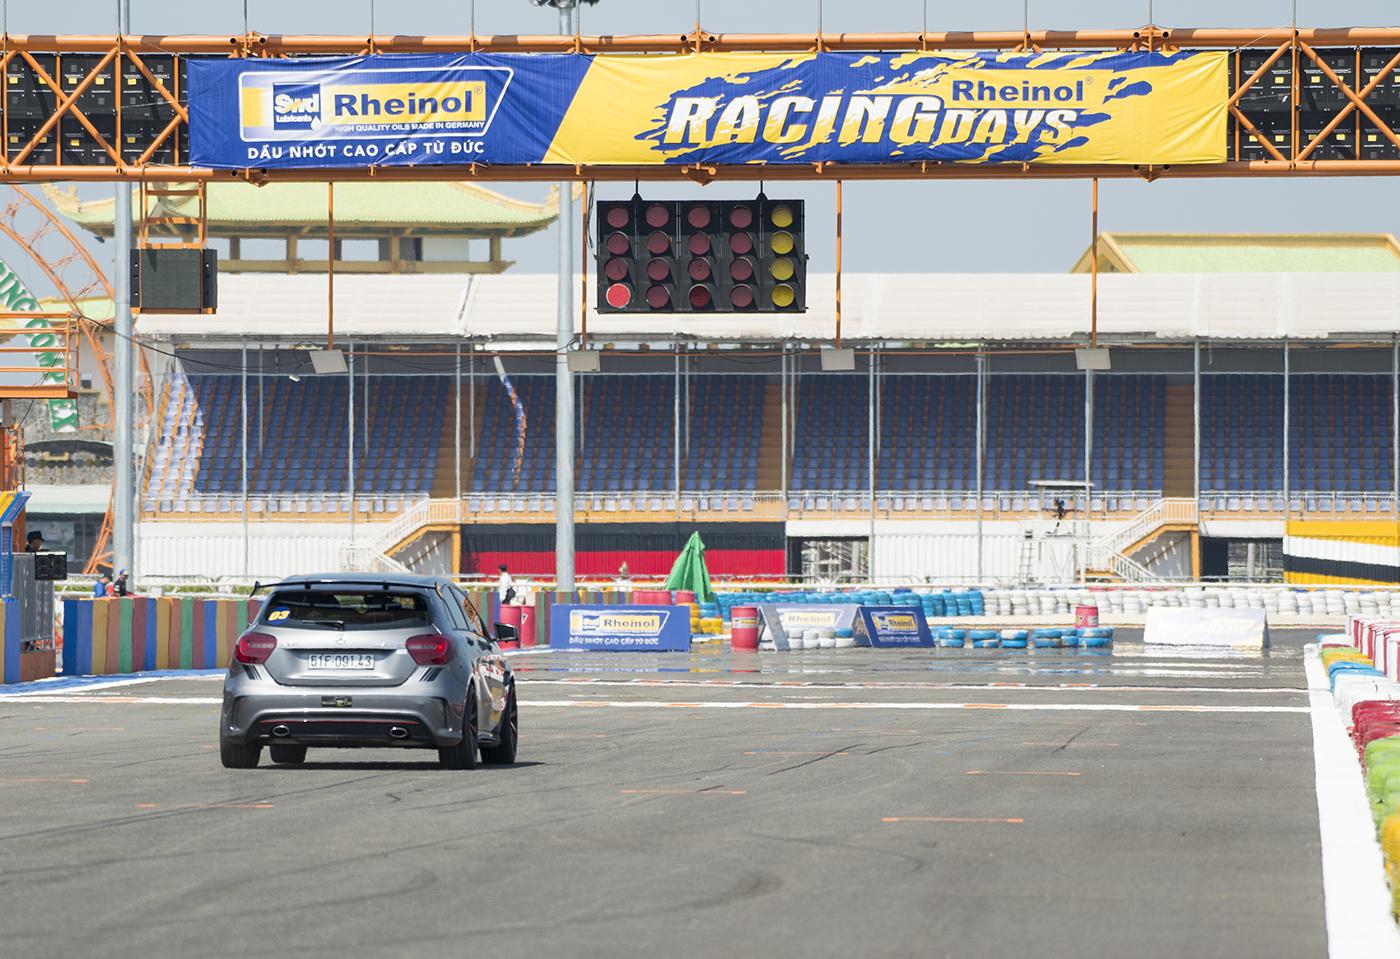 rheinol-racing-days-autodaily-0-2.jpg